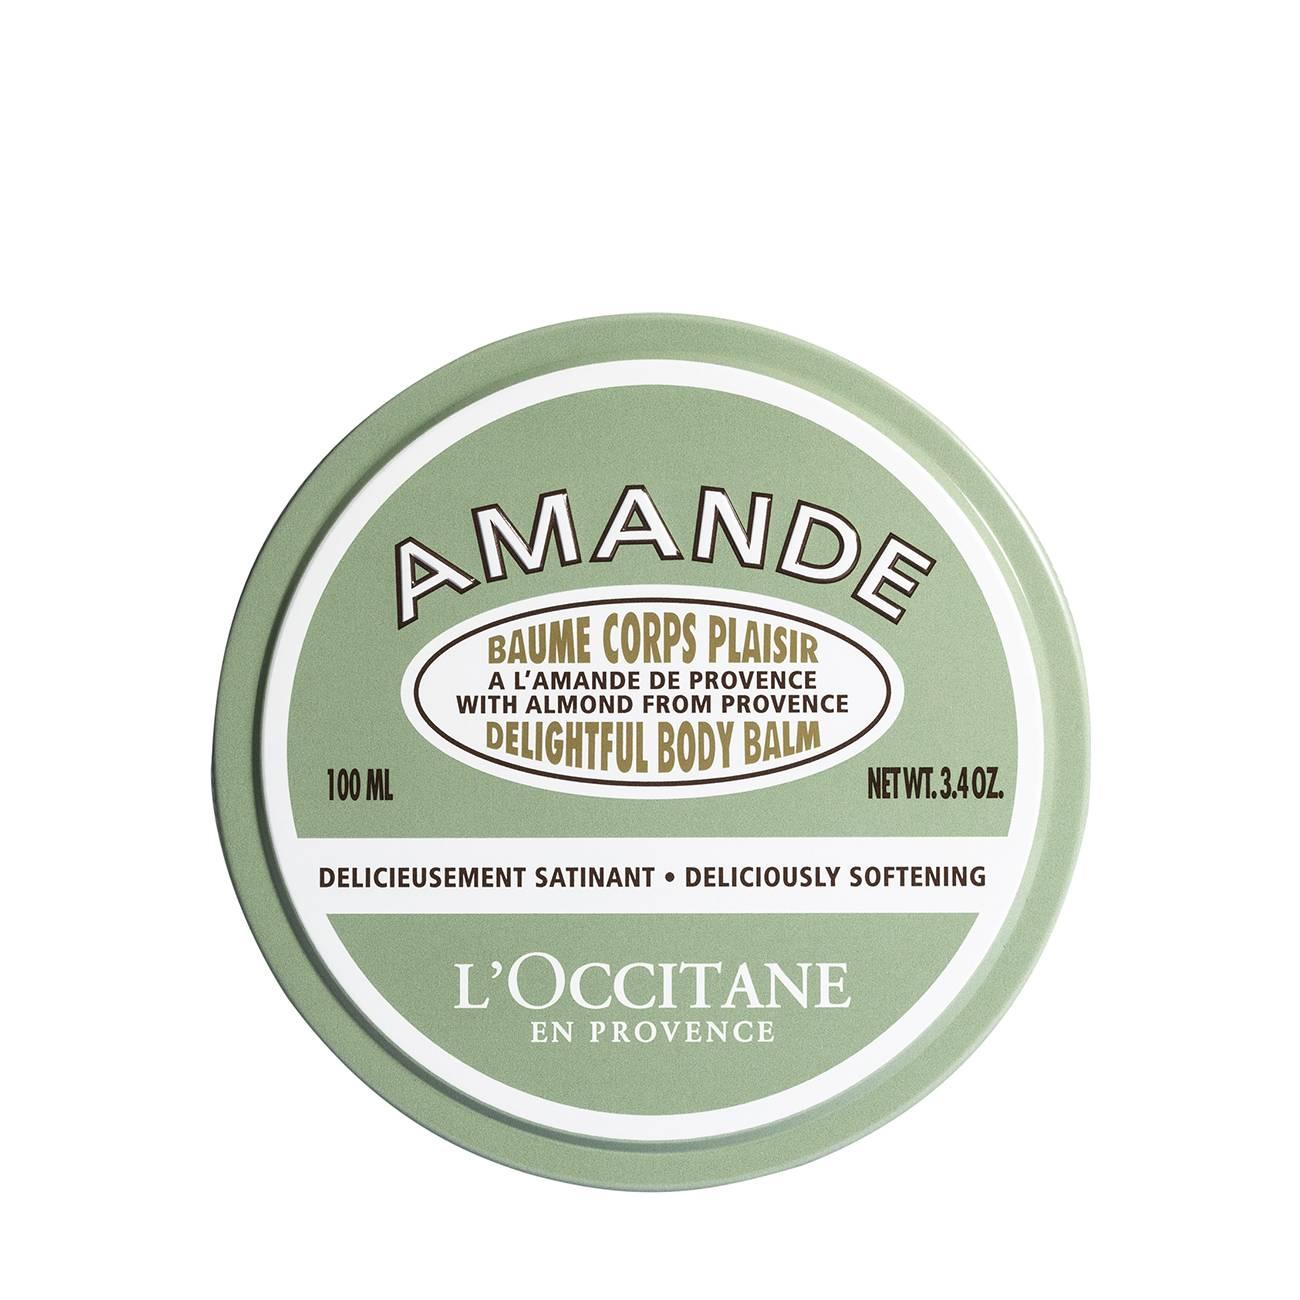 Almond Delightful Body Balm 100ml L'occitane imagine 2021 bestvalue.eu